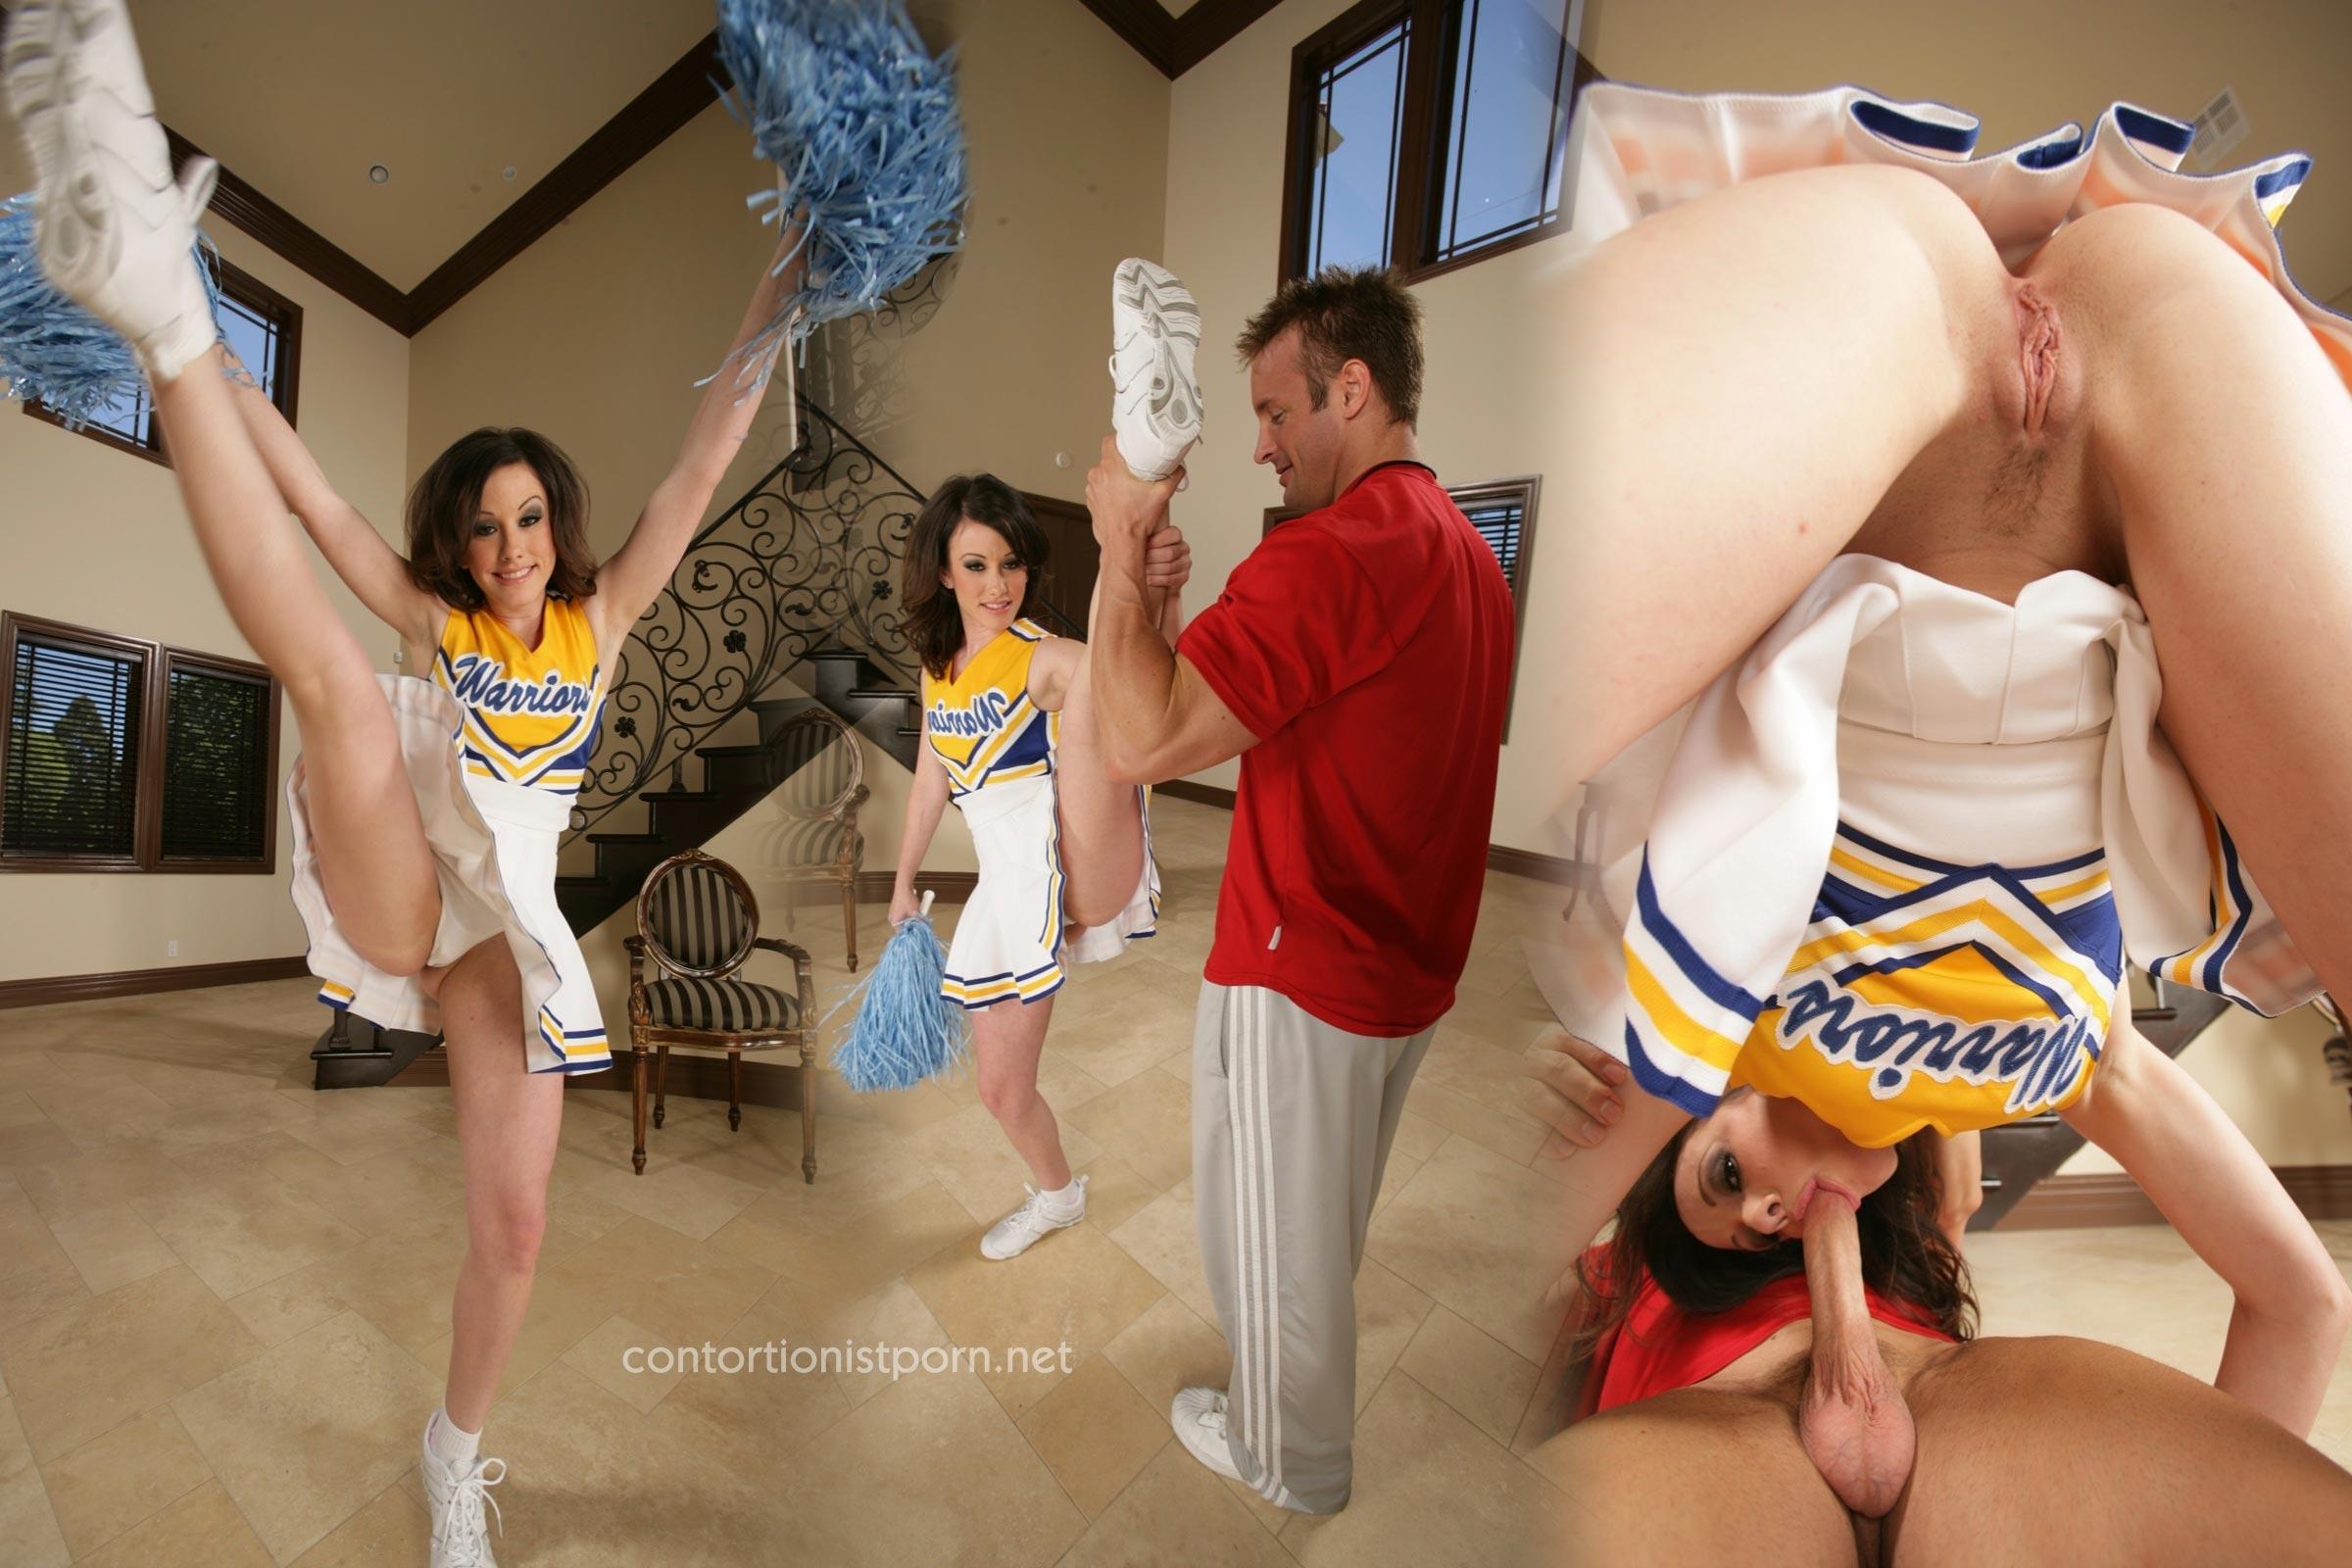 Nude college cheerleader pic